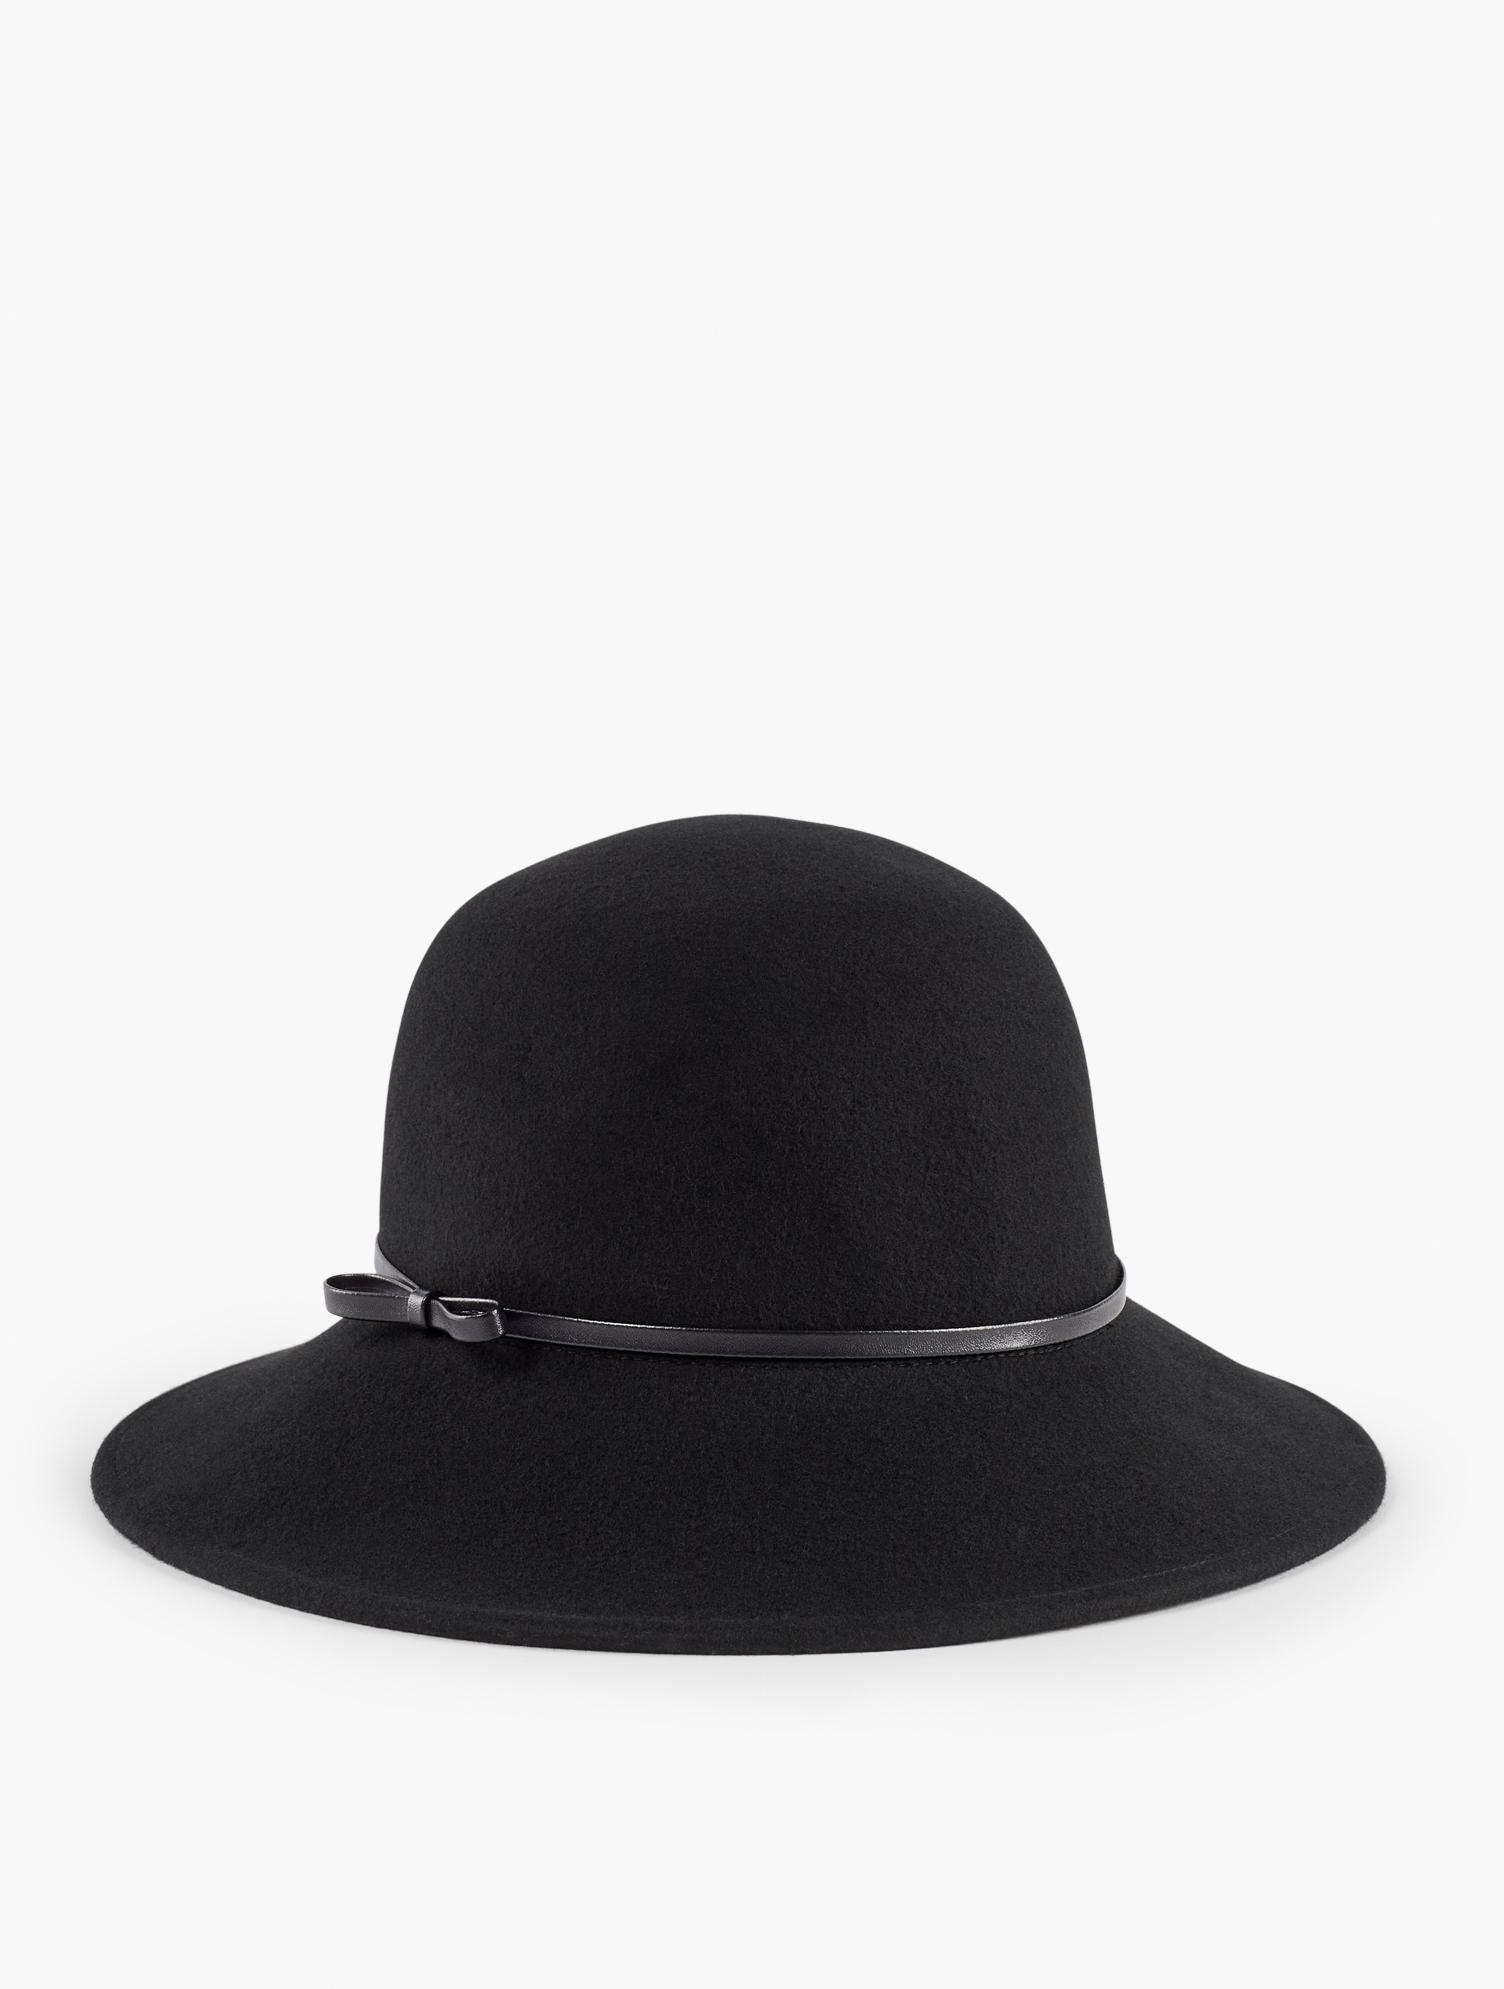 1920s Hat Styles for Women – History Beyond the Cloche Hat Wool Felt Hat - Black - 001 Talbots $69.50 AT vintagedancer.com